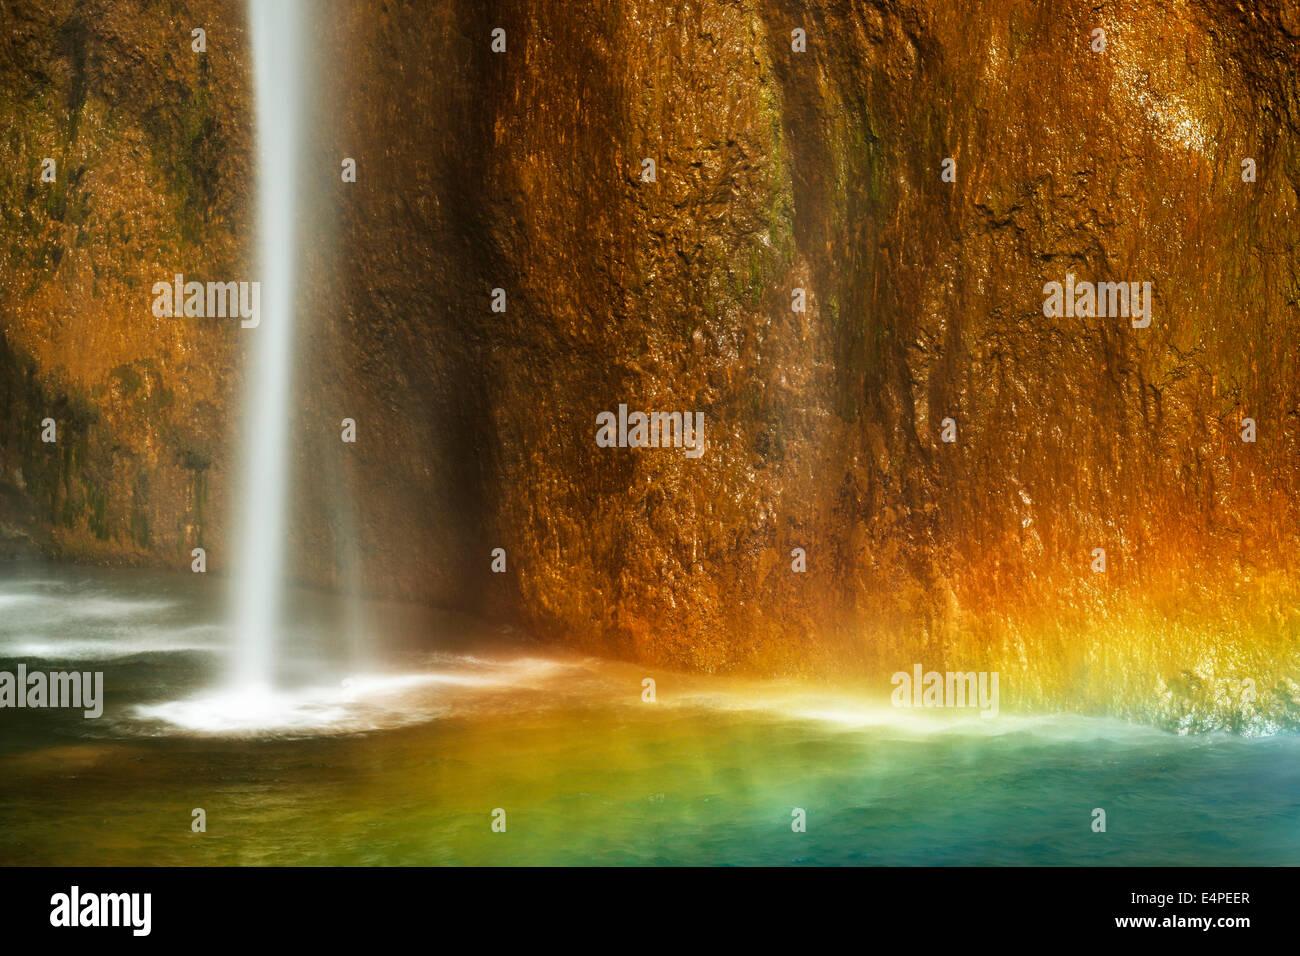 Waterfall with a rainbow, Plitvice Lakes National Park, Plitvice Jezera, Lika-Senj, Croatia - Stock Image